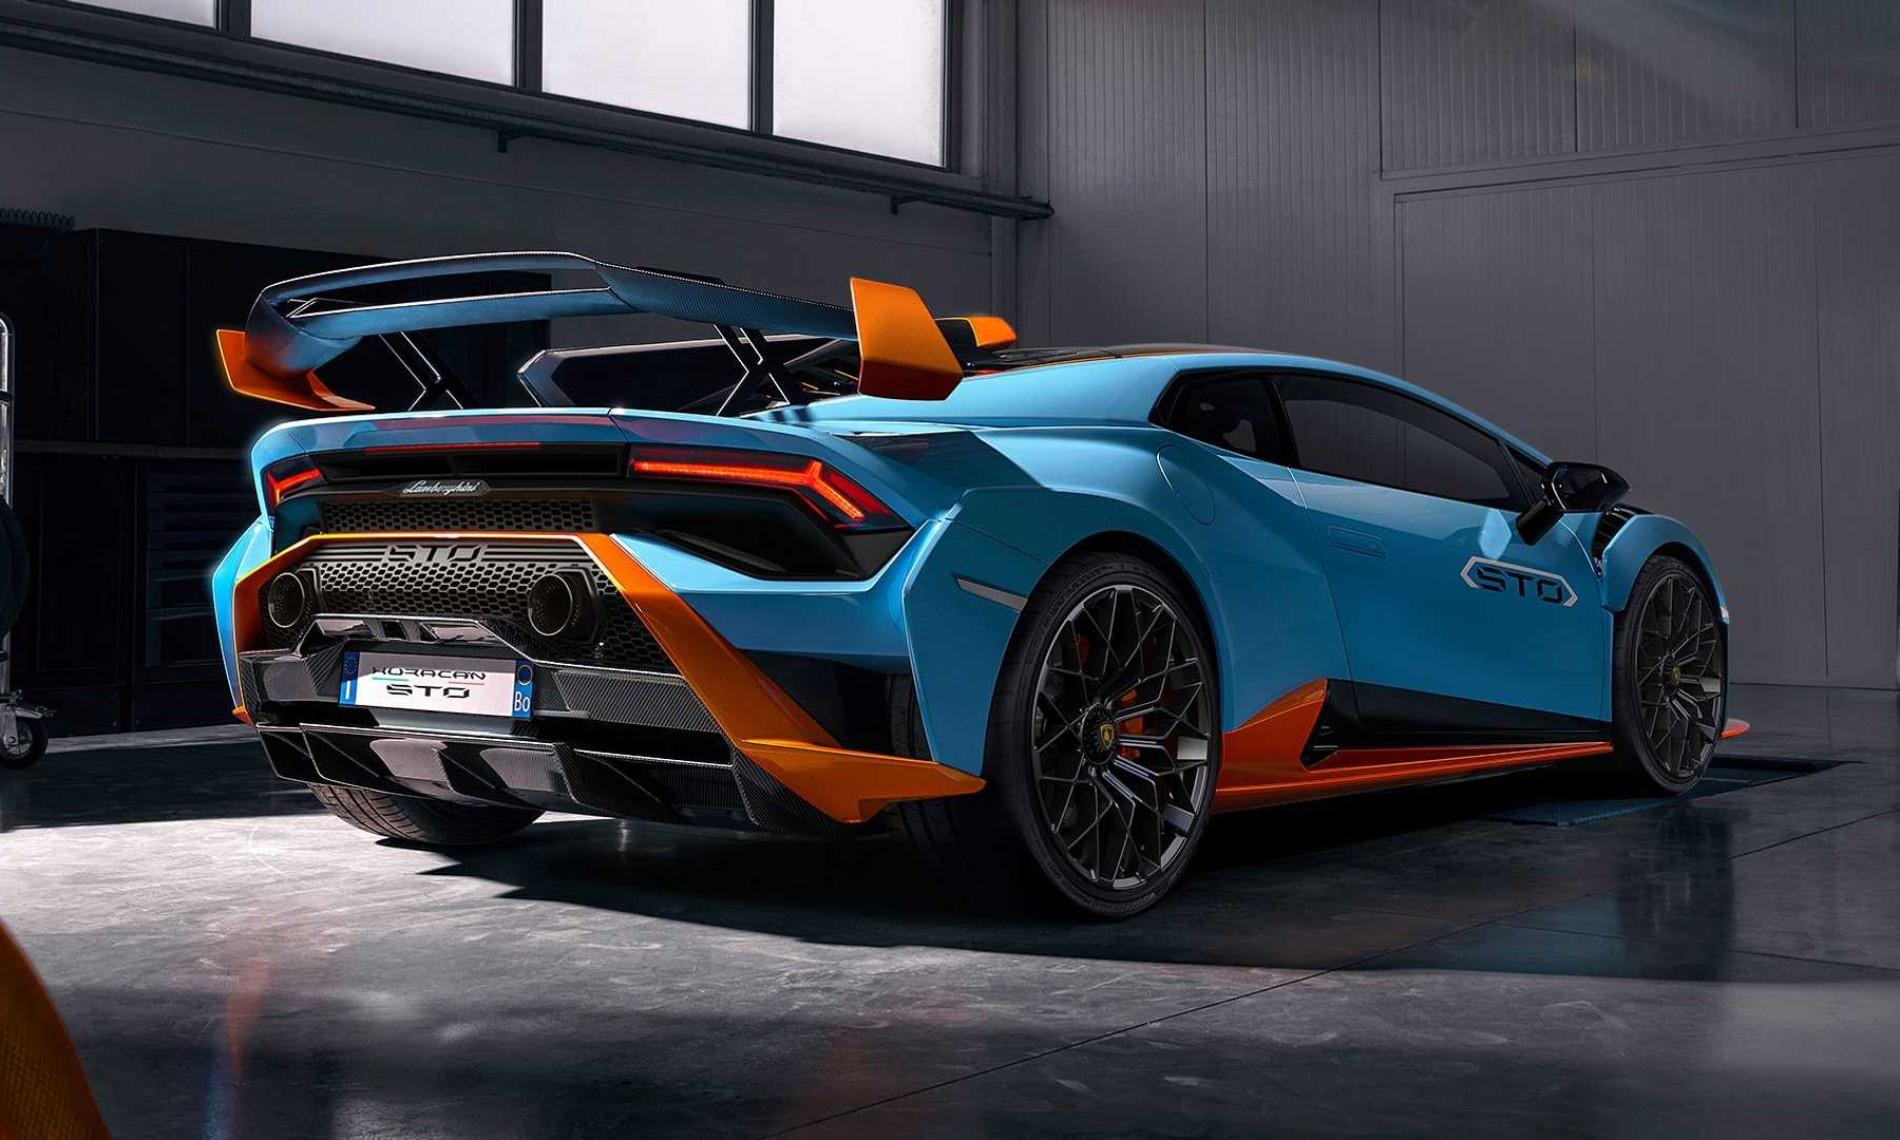 Lamborghini Huracan STO rear